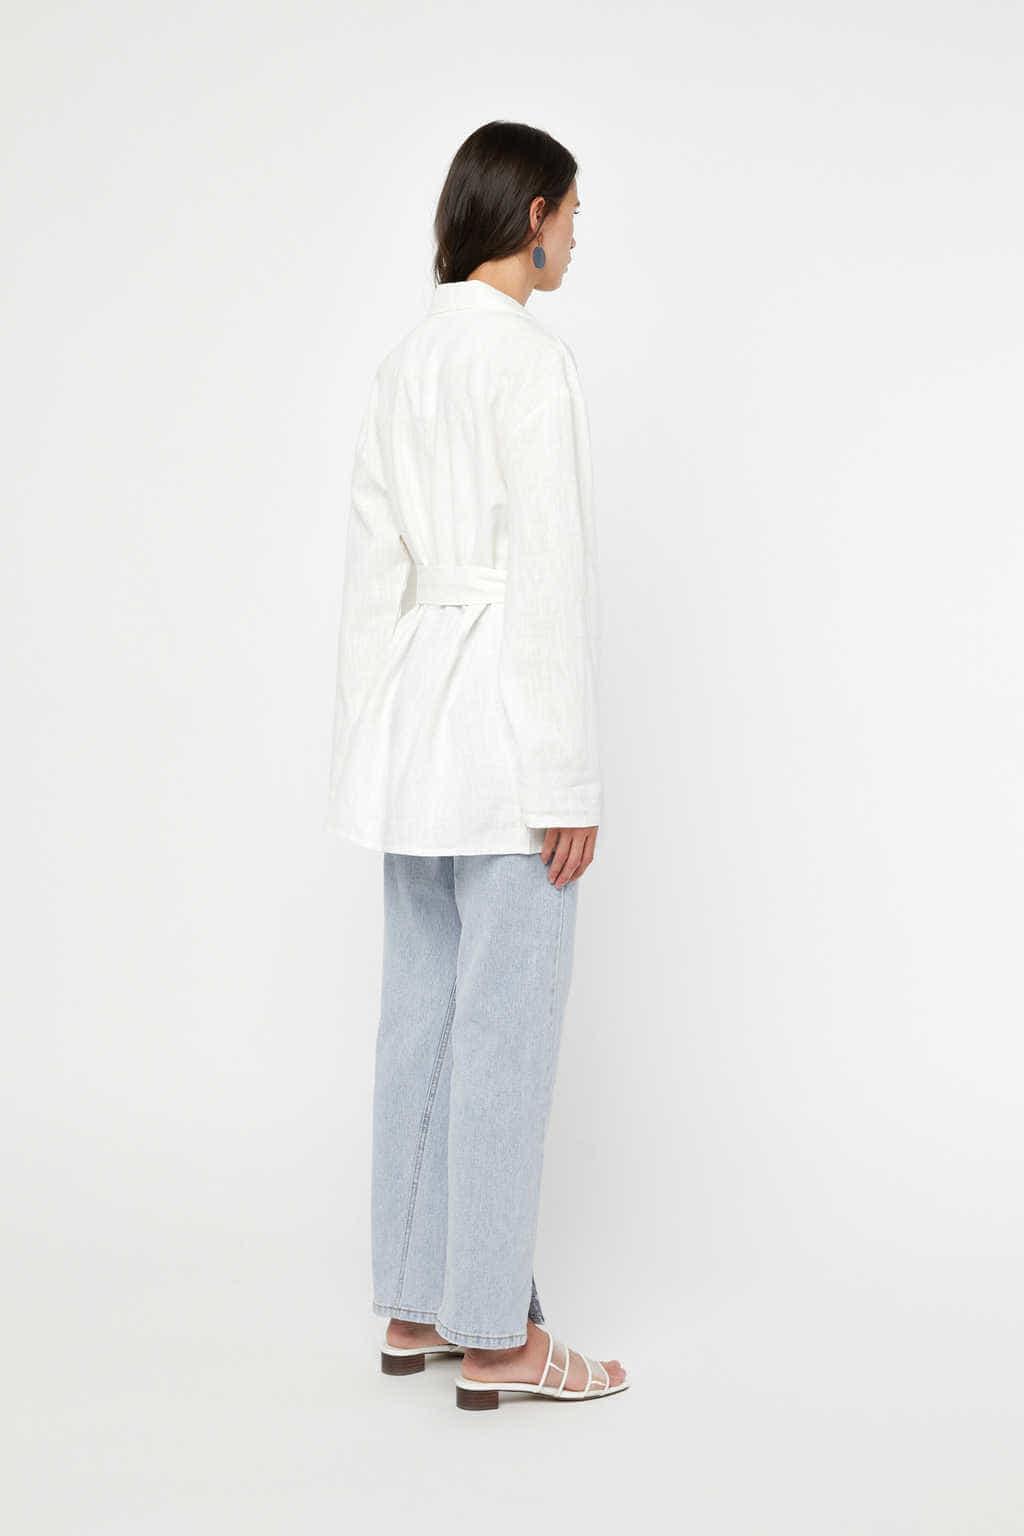 Jacket K019 Cream 5